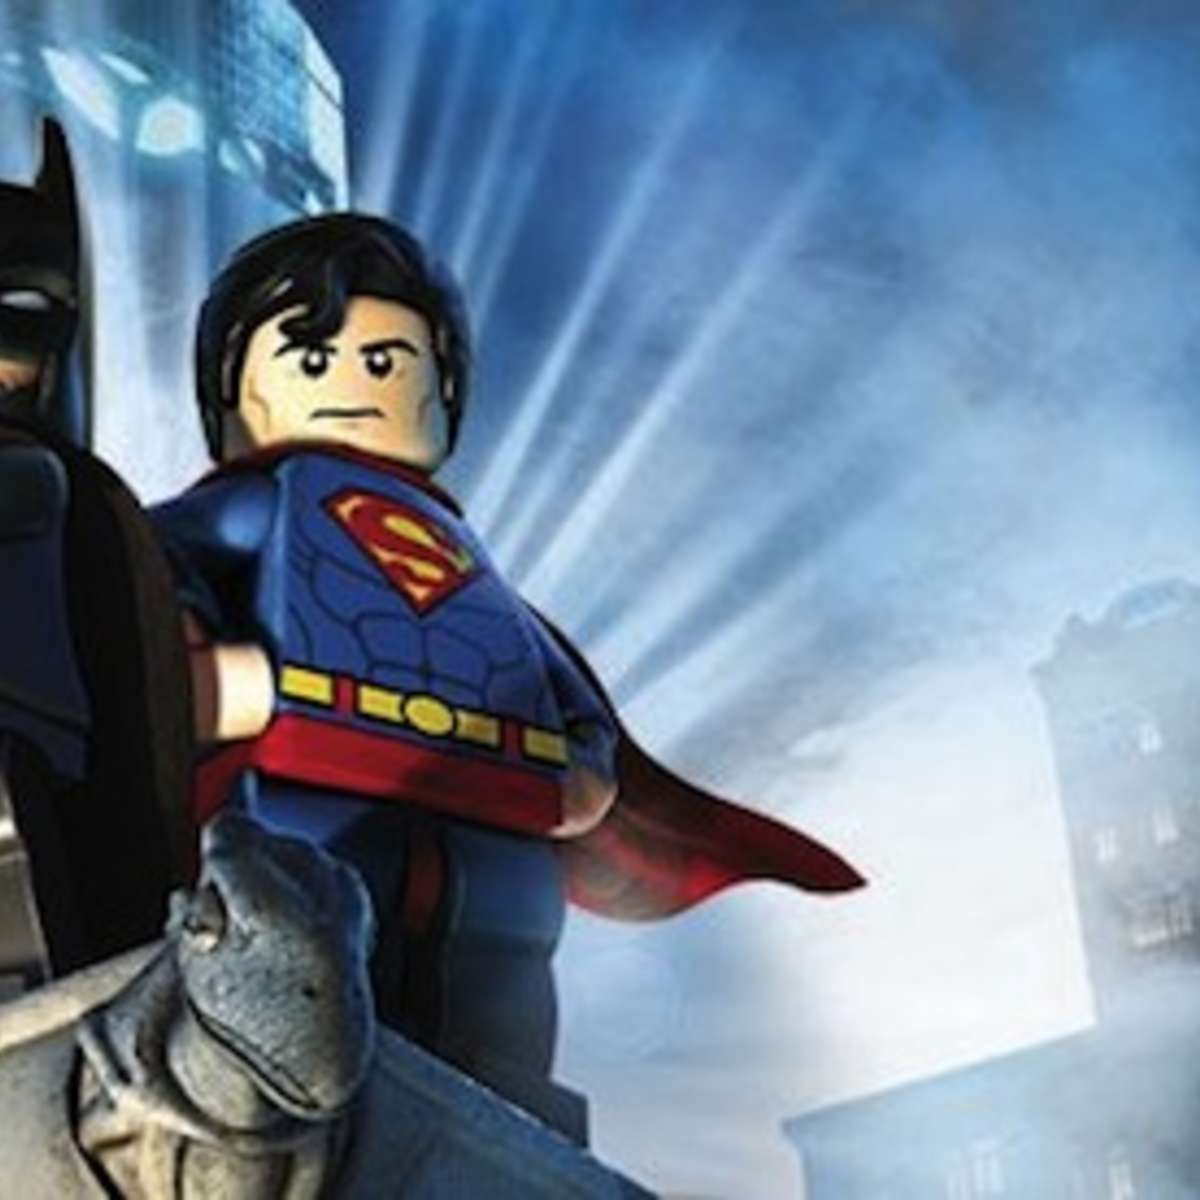 Lego-Batman-and-Superman.jpg